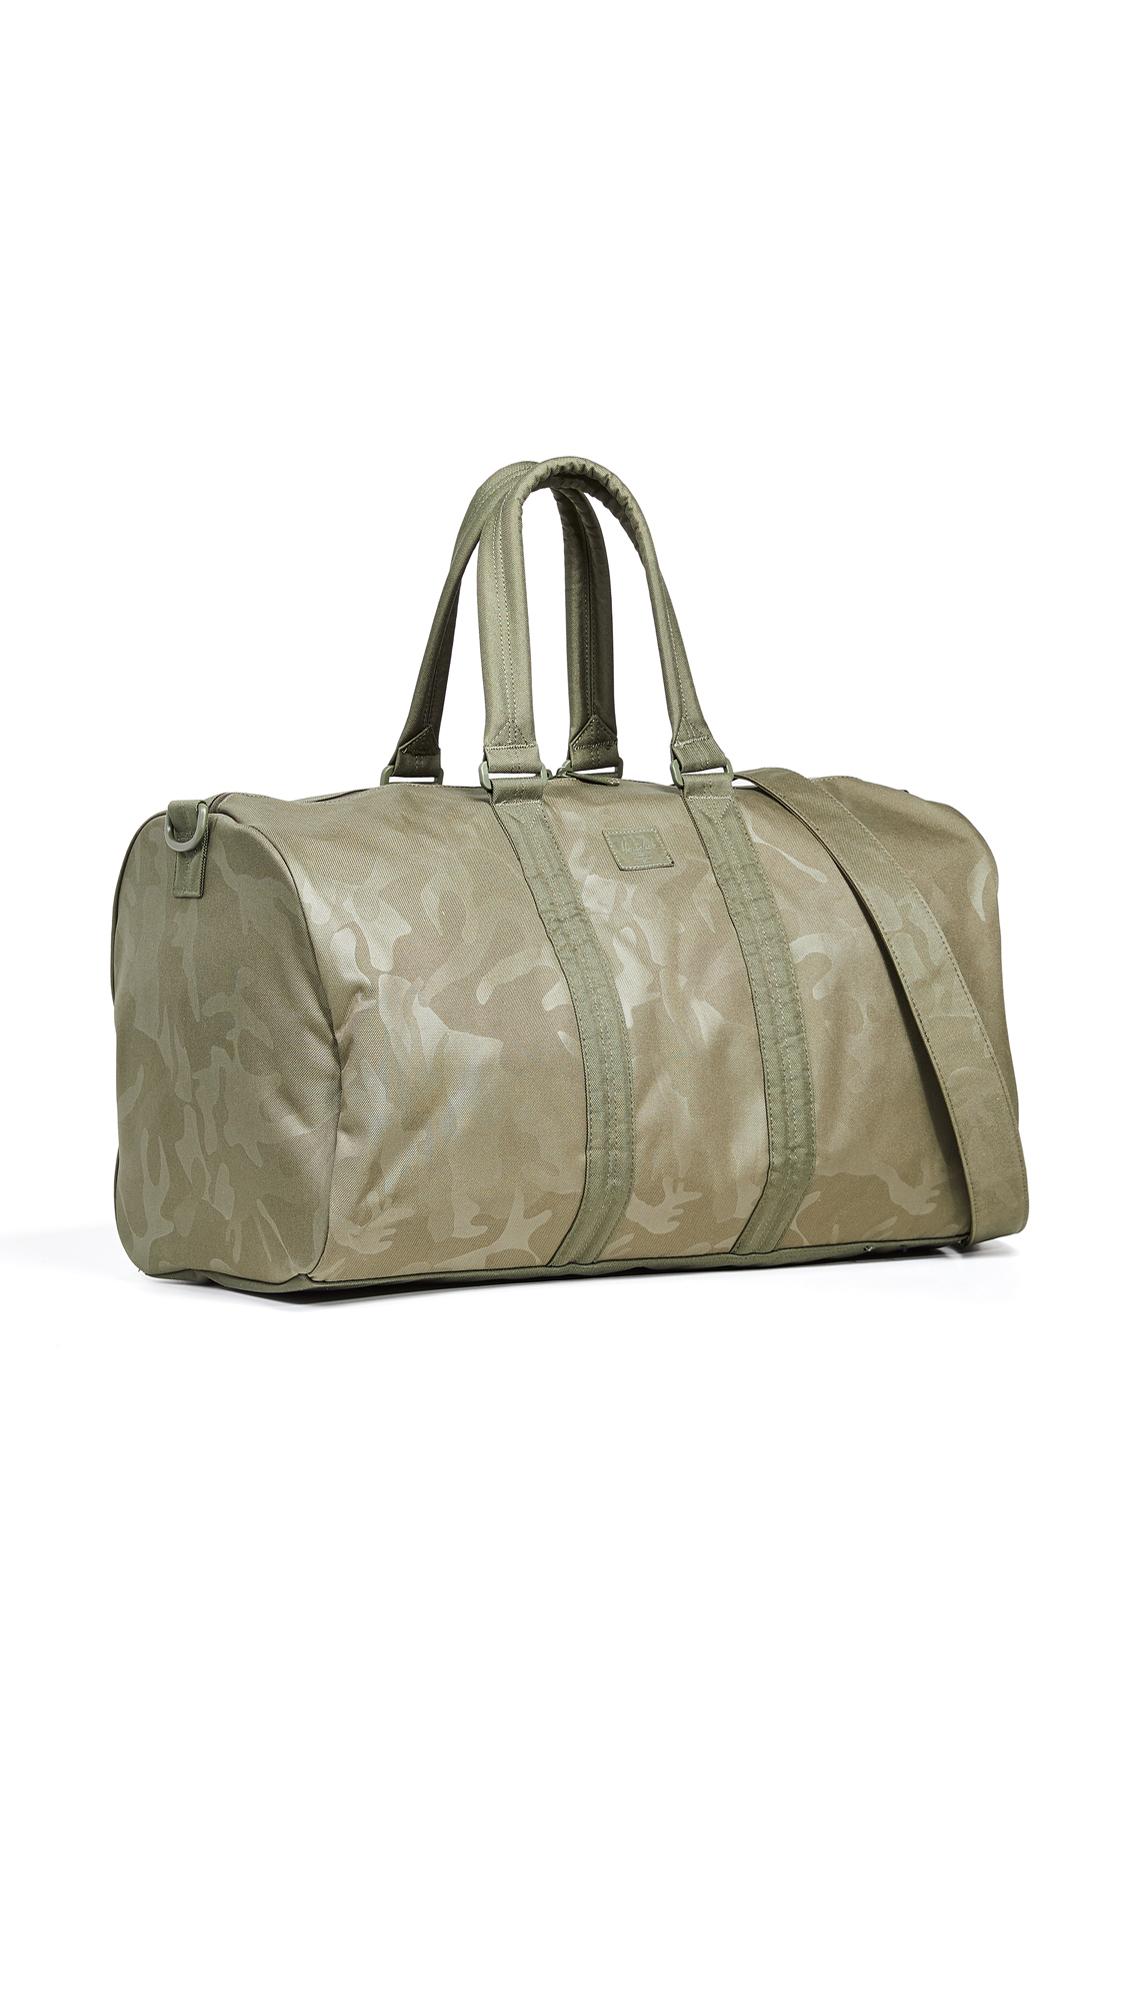 899bd23d84b54 Herschel Supply Co. Novel Duffel Bag In Olive Night Tonal Camo ...